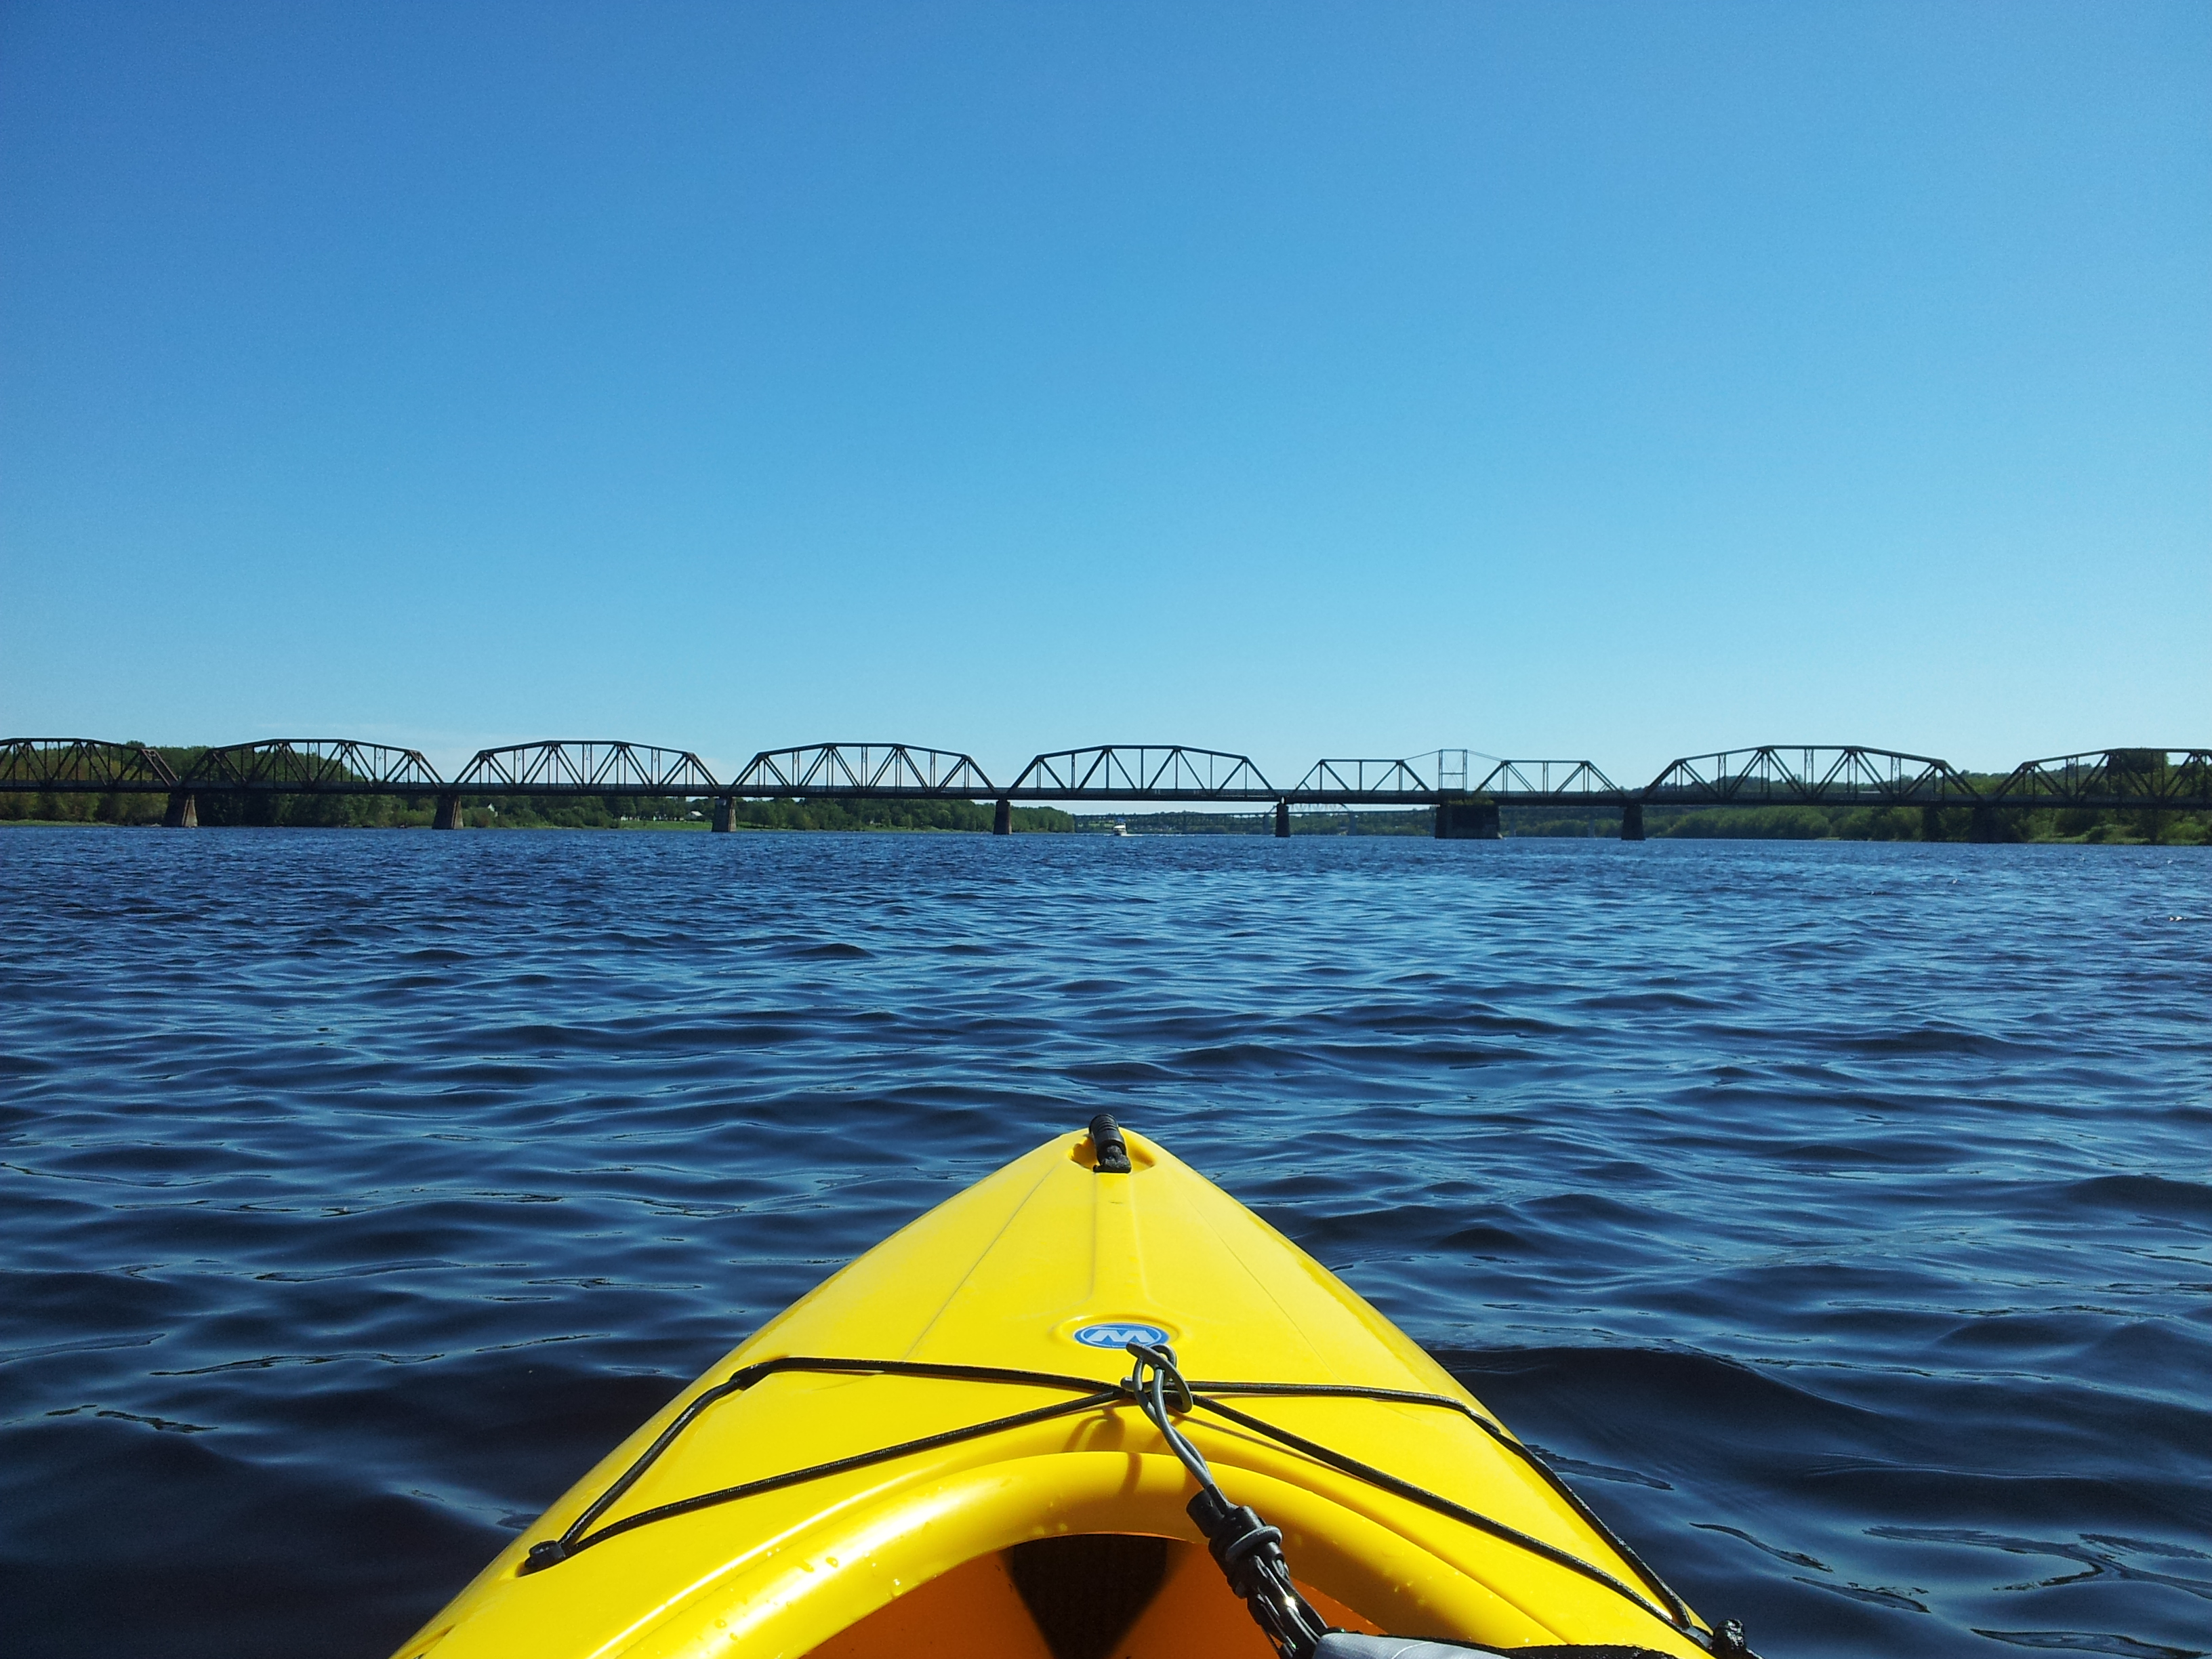 Kayaking on the Saint John River in Fredericton